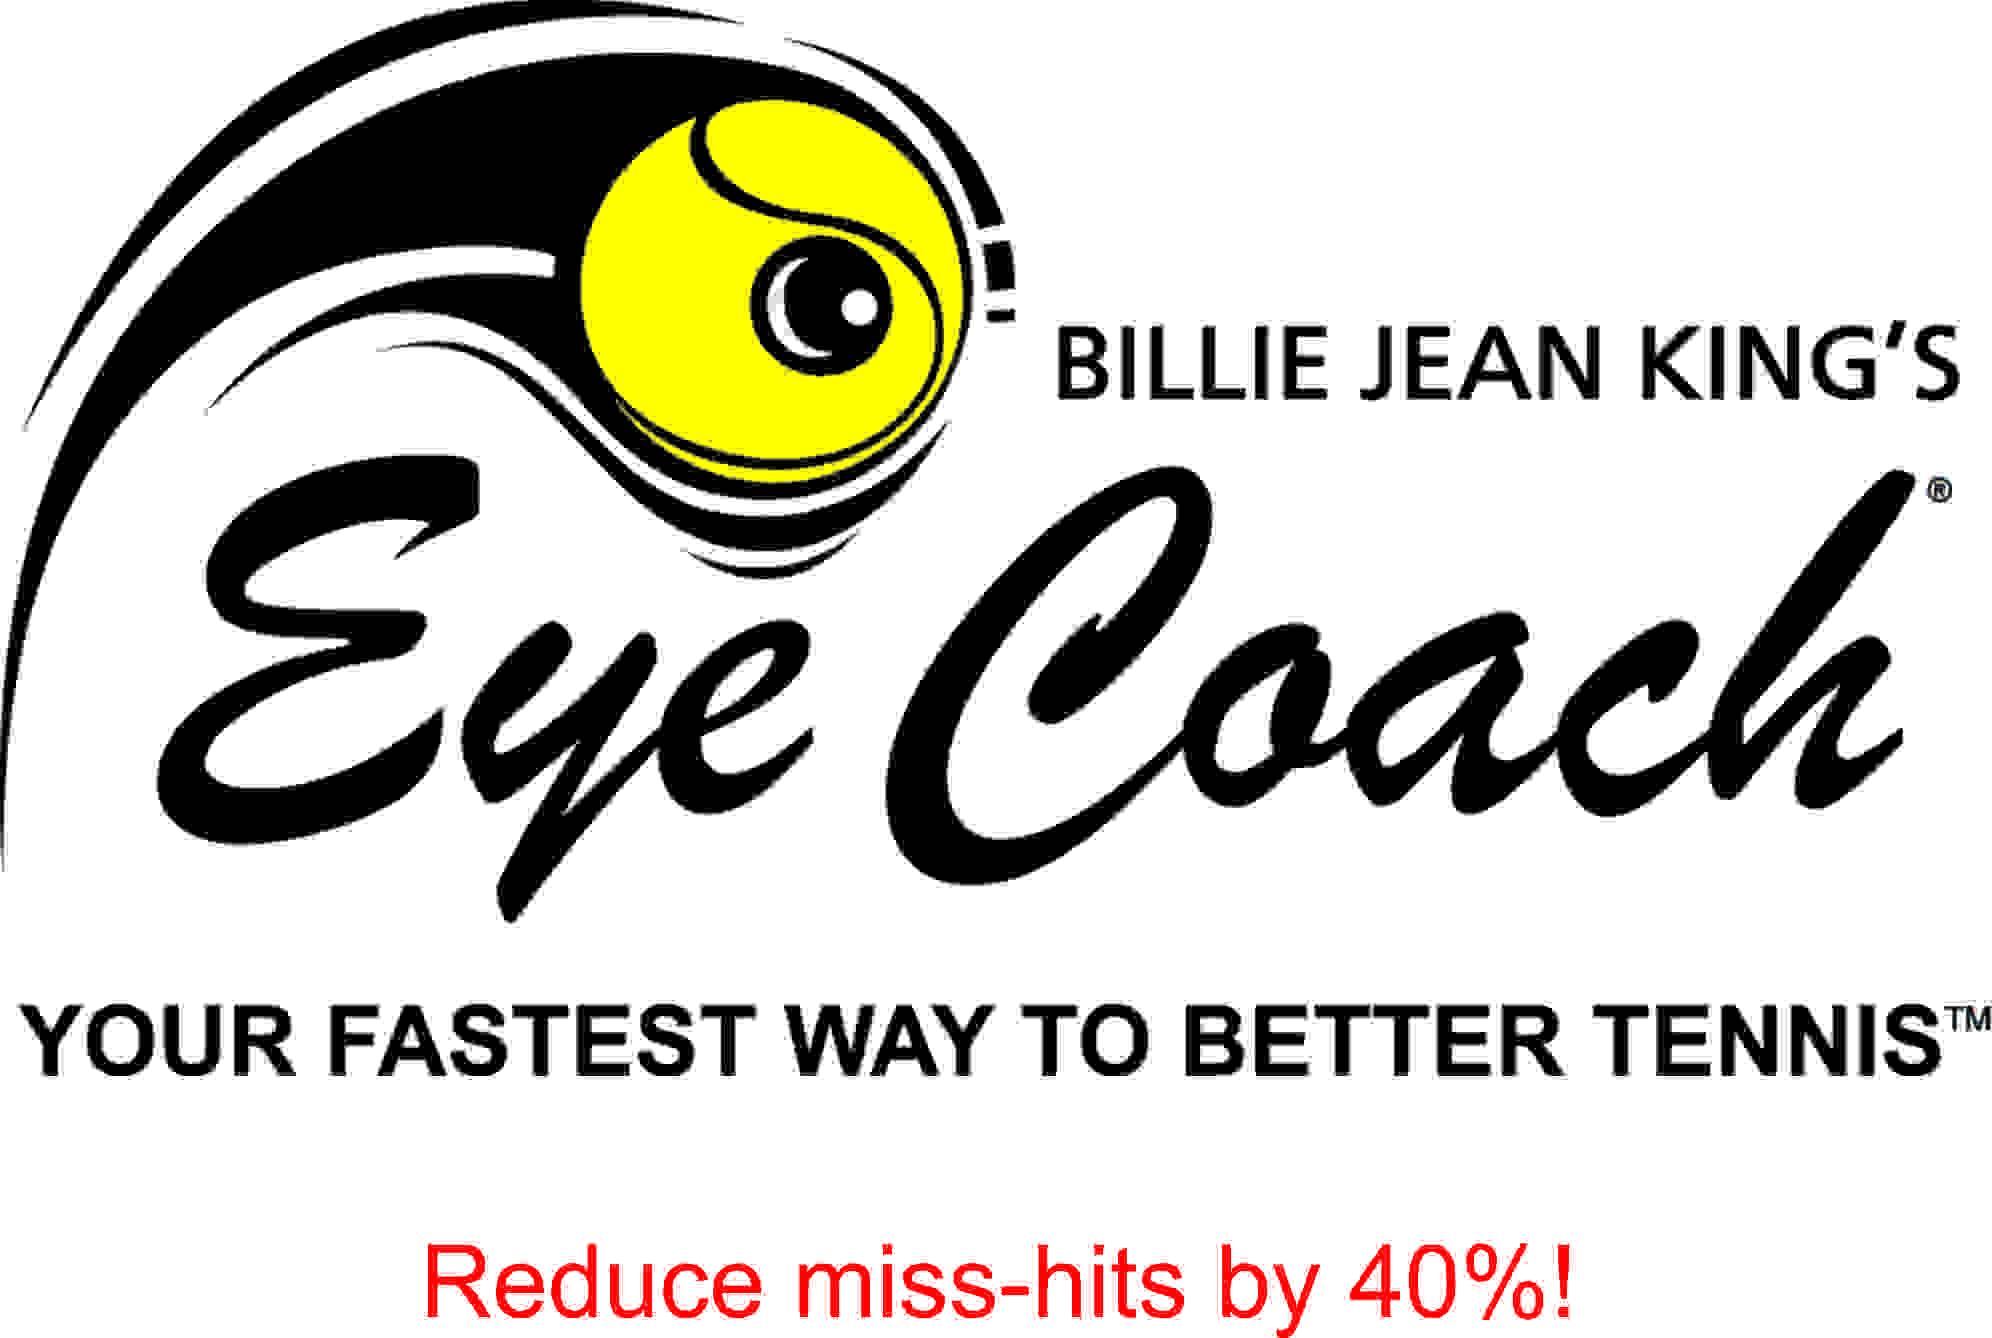 Eye Coach Landing Banner Miss-hits